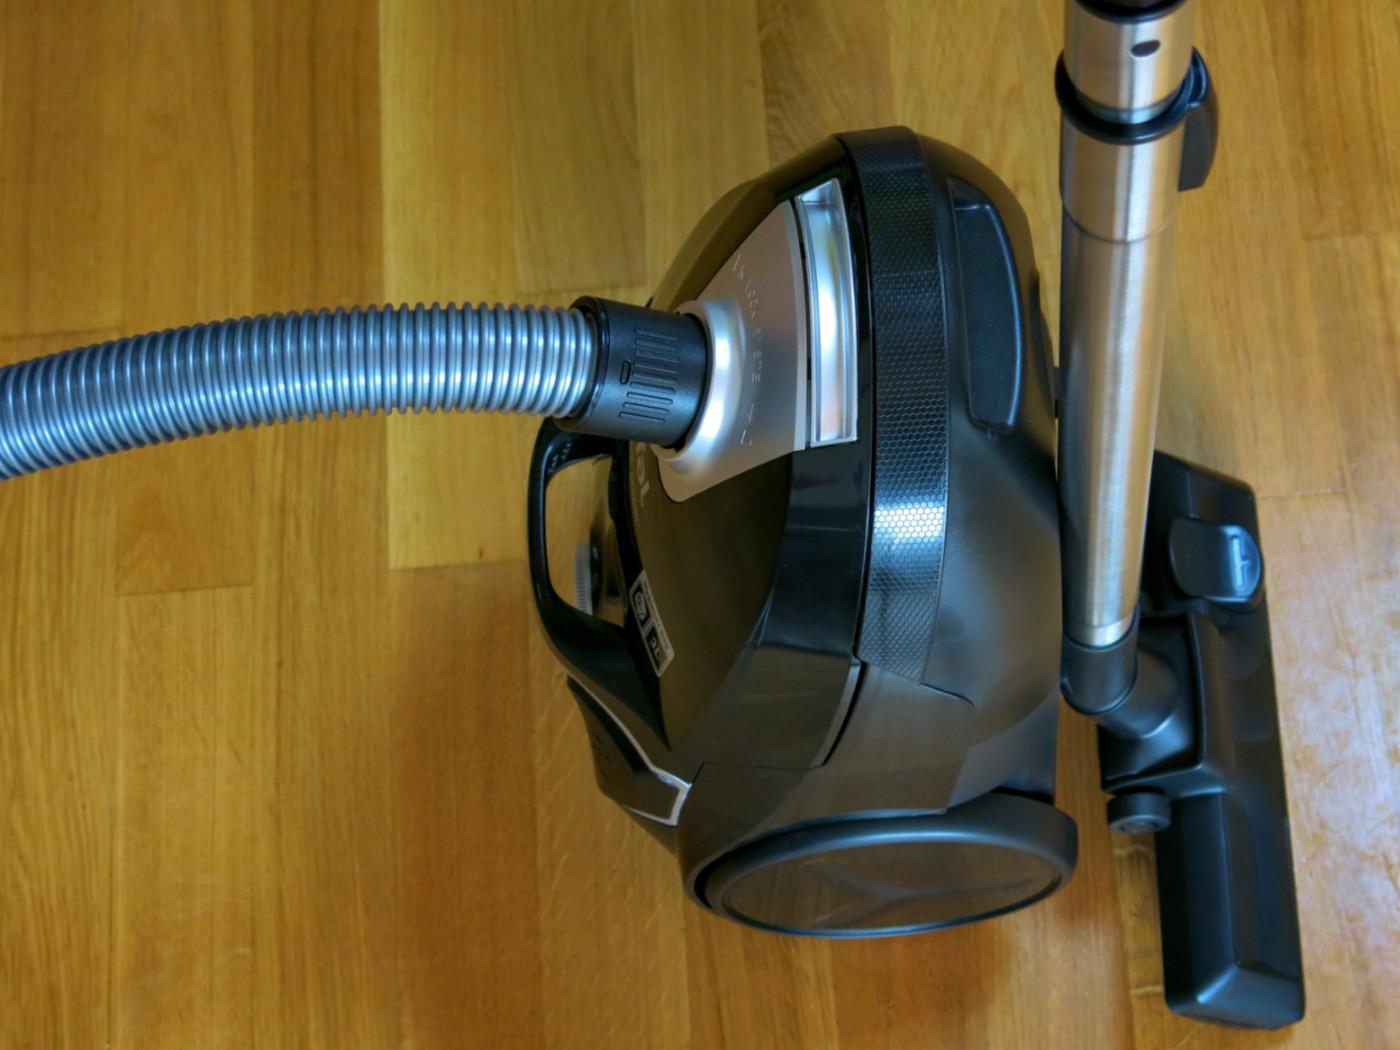 TEFAL Compact Power TW3985 parkowanie